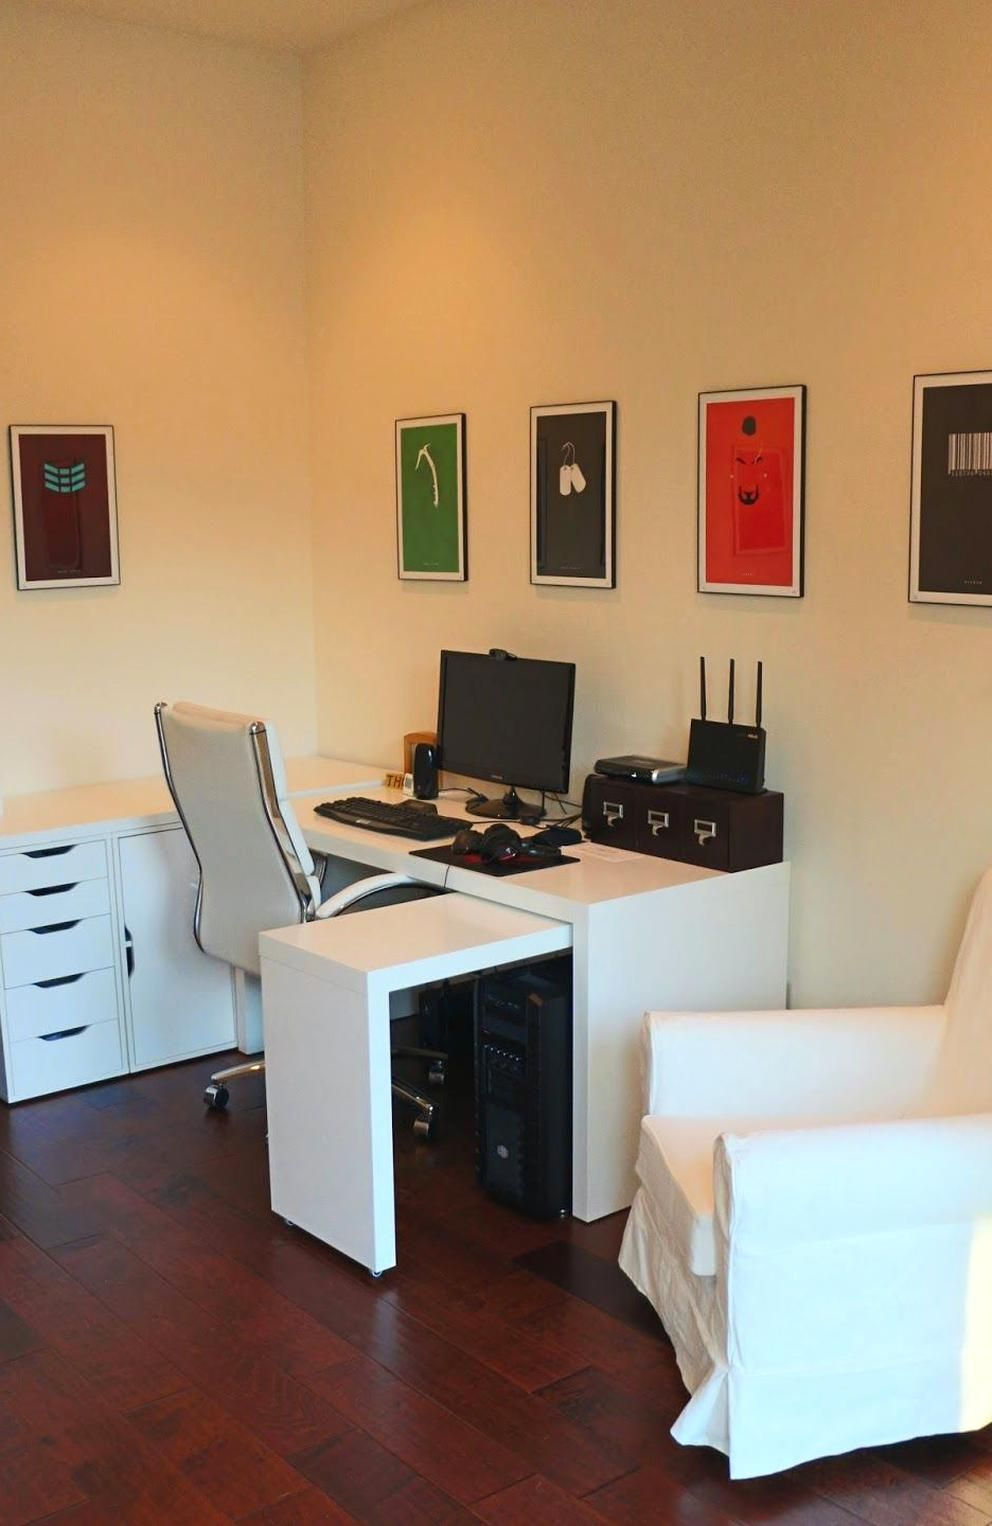 Pin By Anna Fox On Office In 2020 Ikea Malm Desk Home Office Furniture Ikea Malm